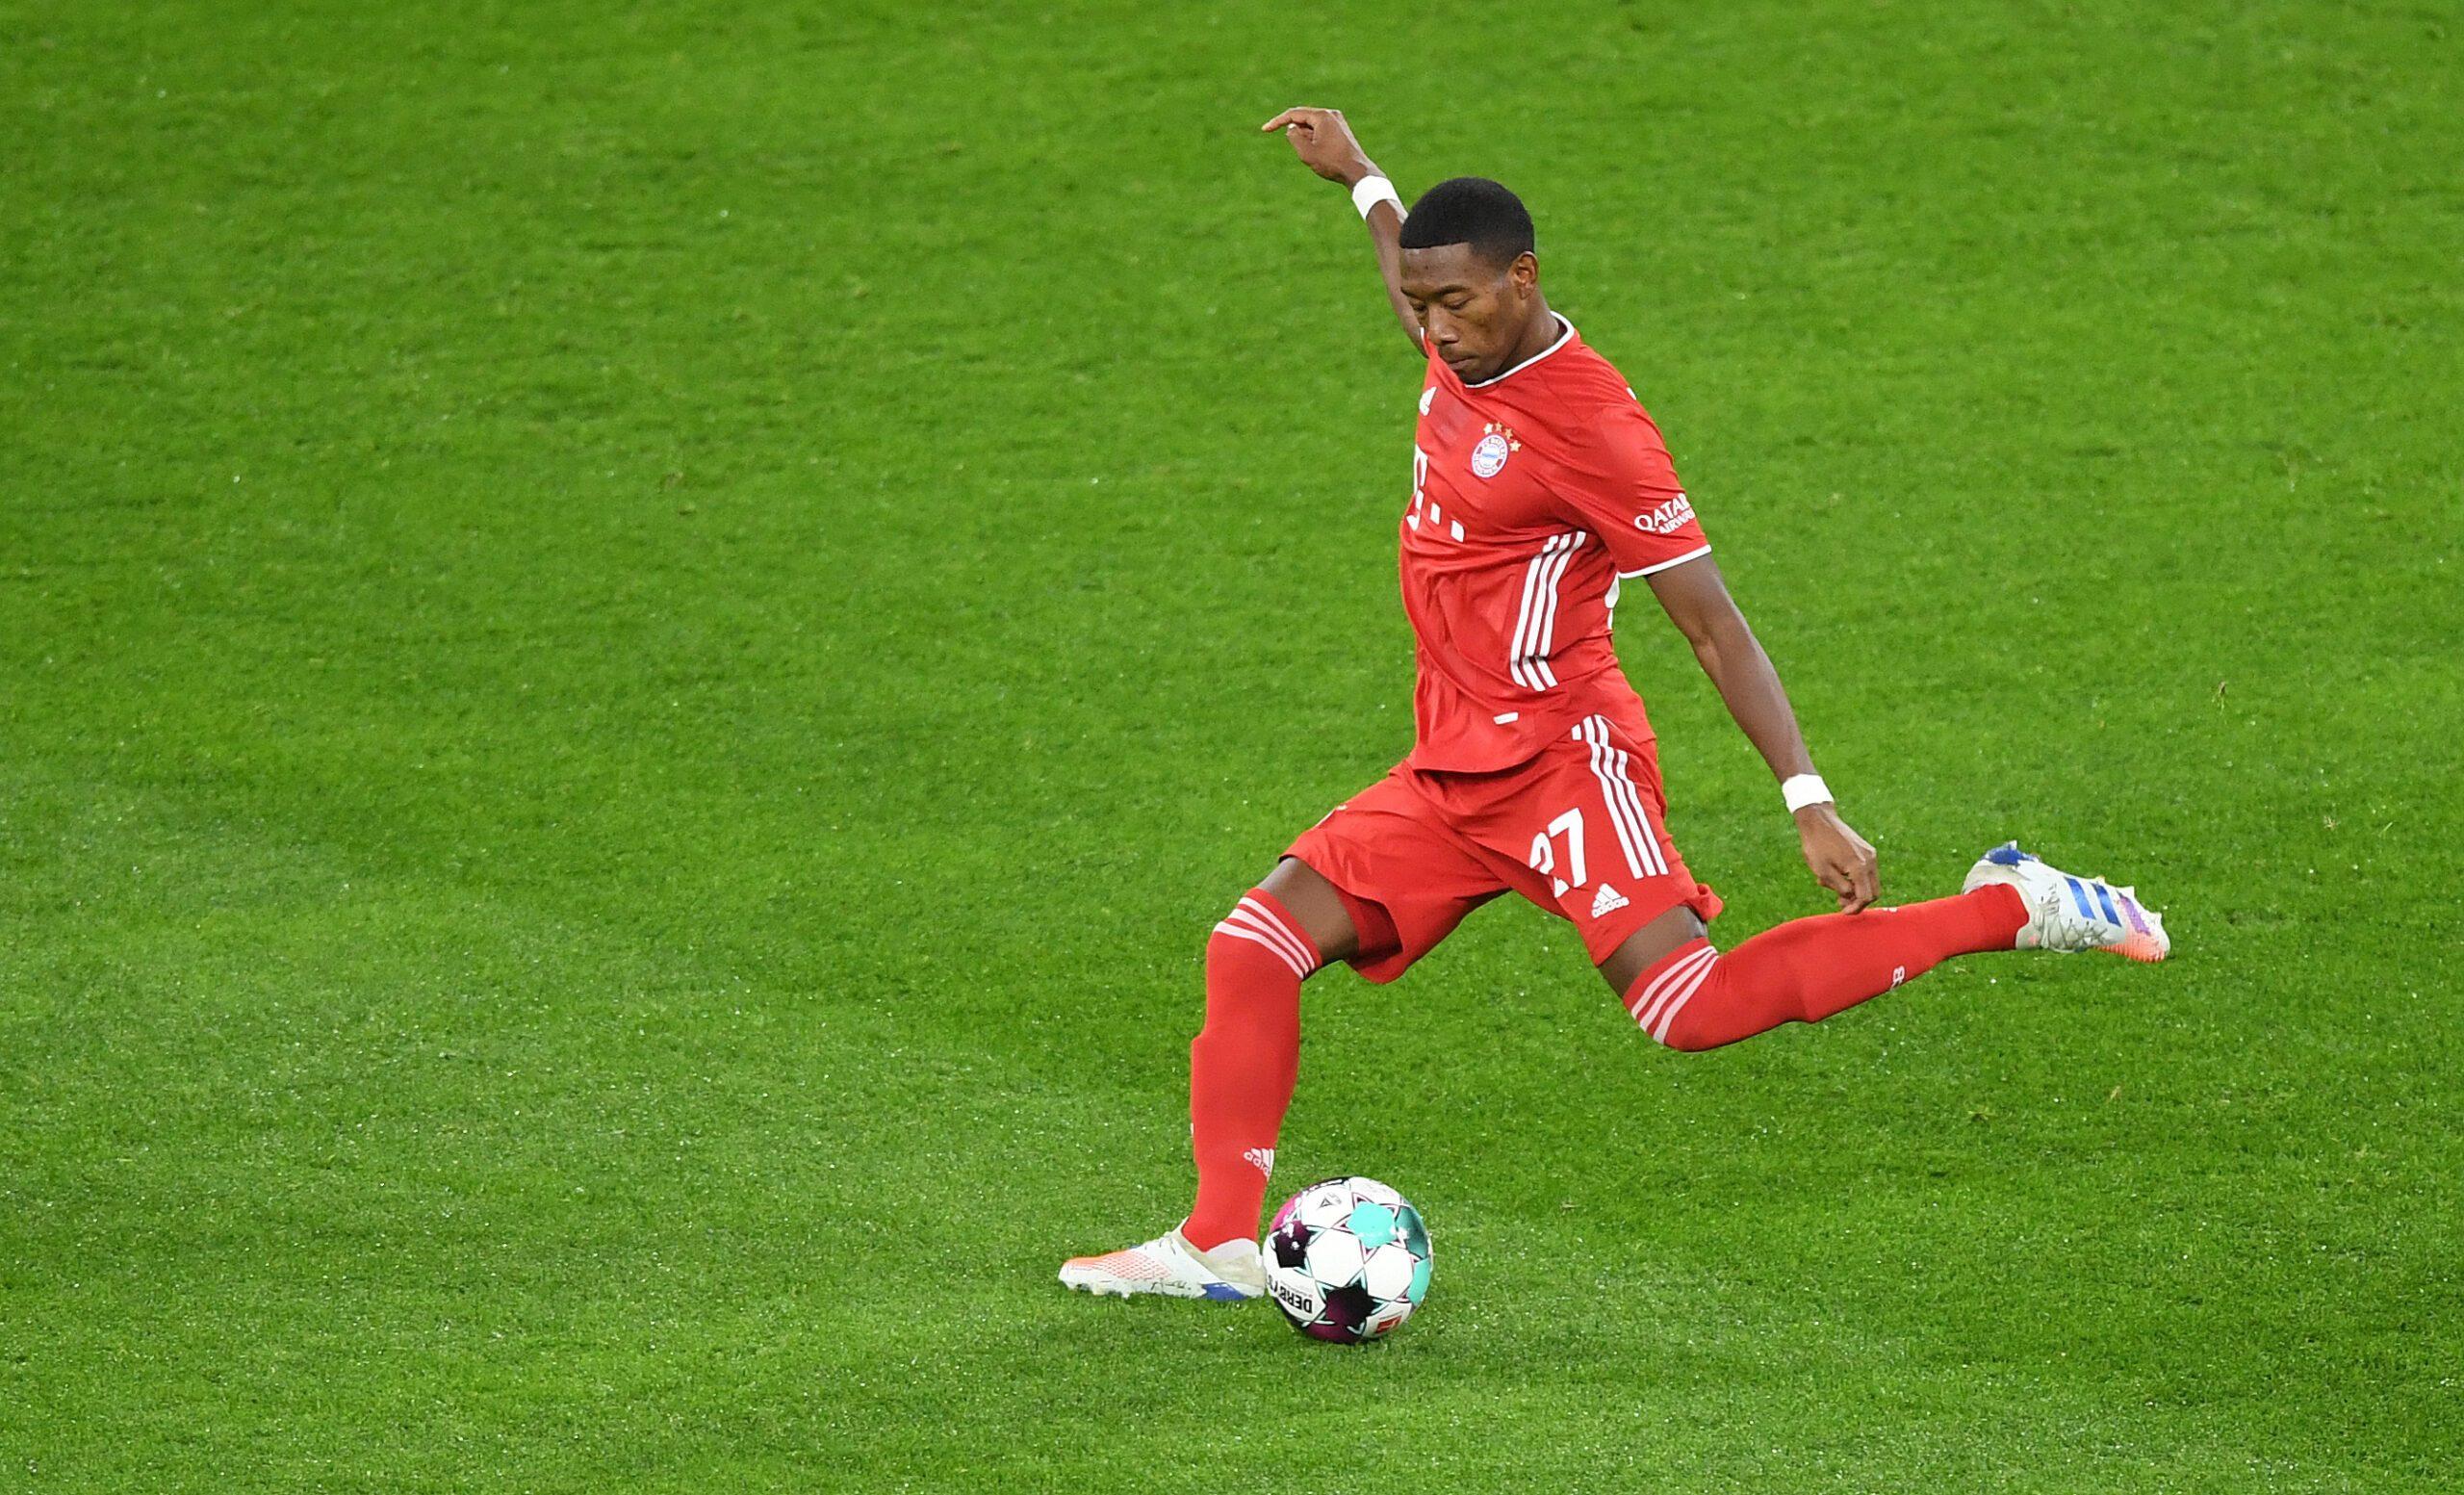 DFB-Pokal: Bayern trifft auf Holstein Kiel (20:45)